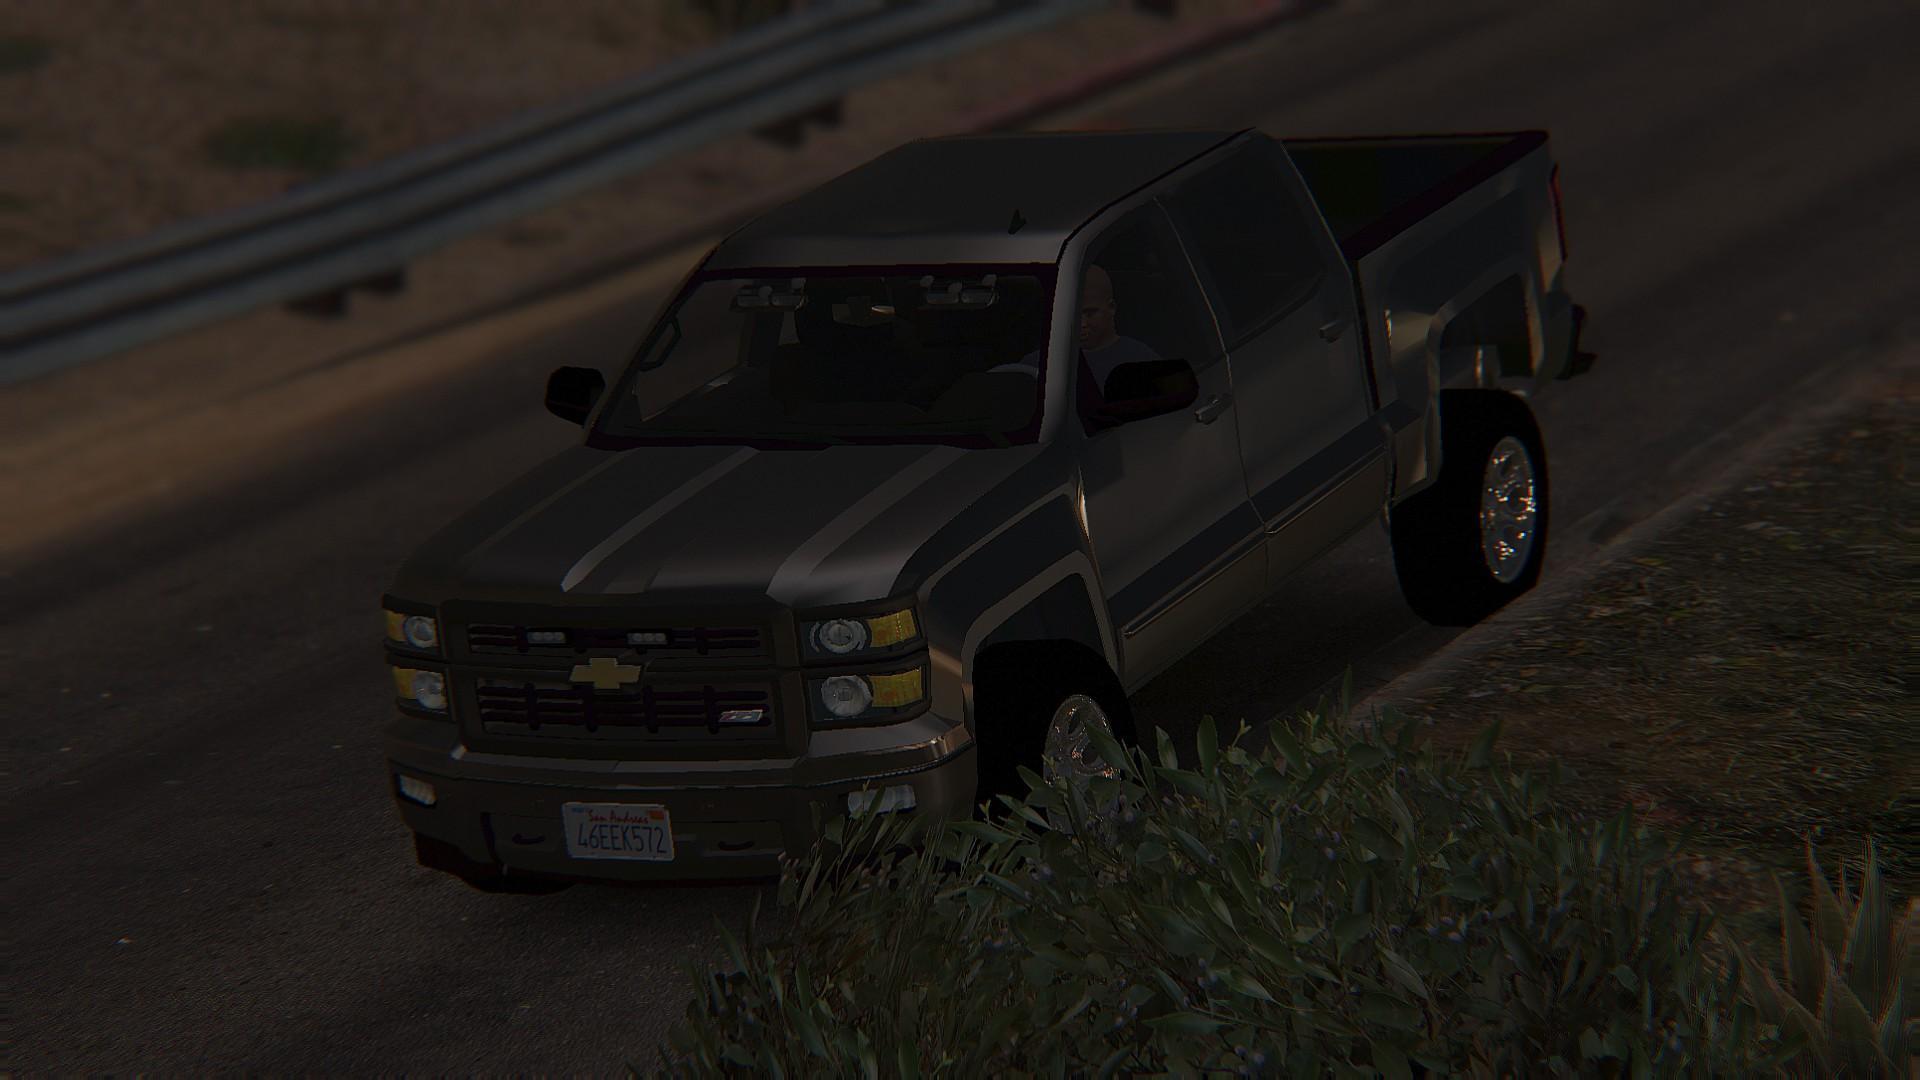 2015 Chevy Silverado Unmarked Gta5 Mods Com